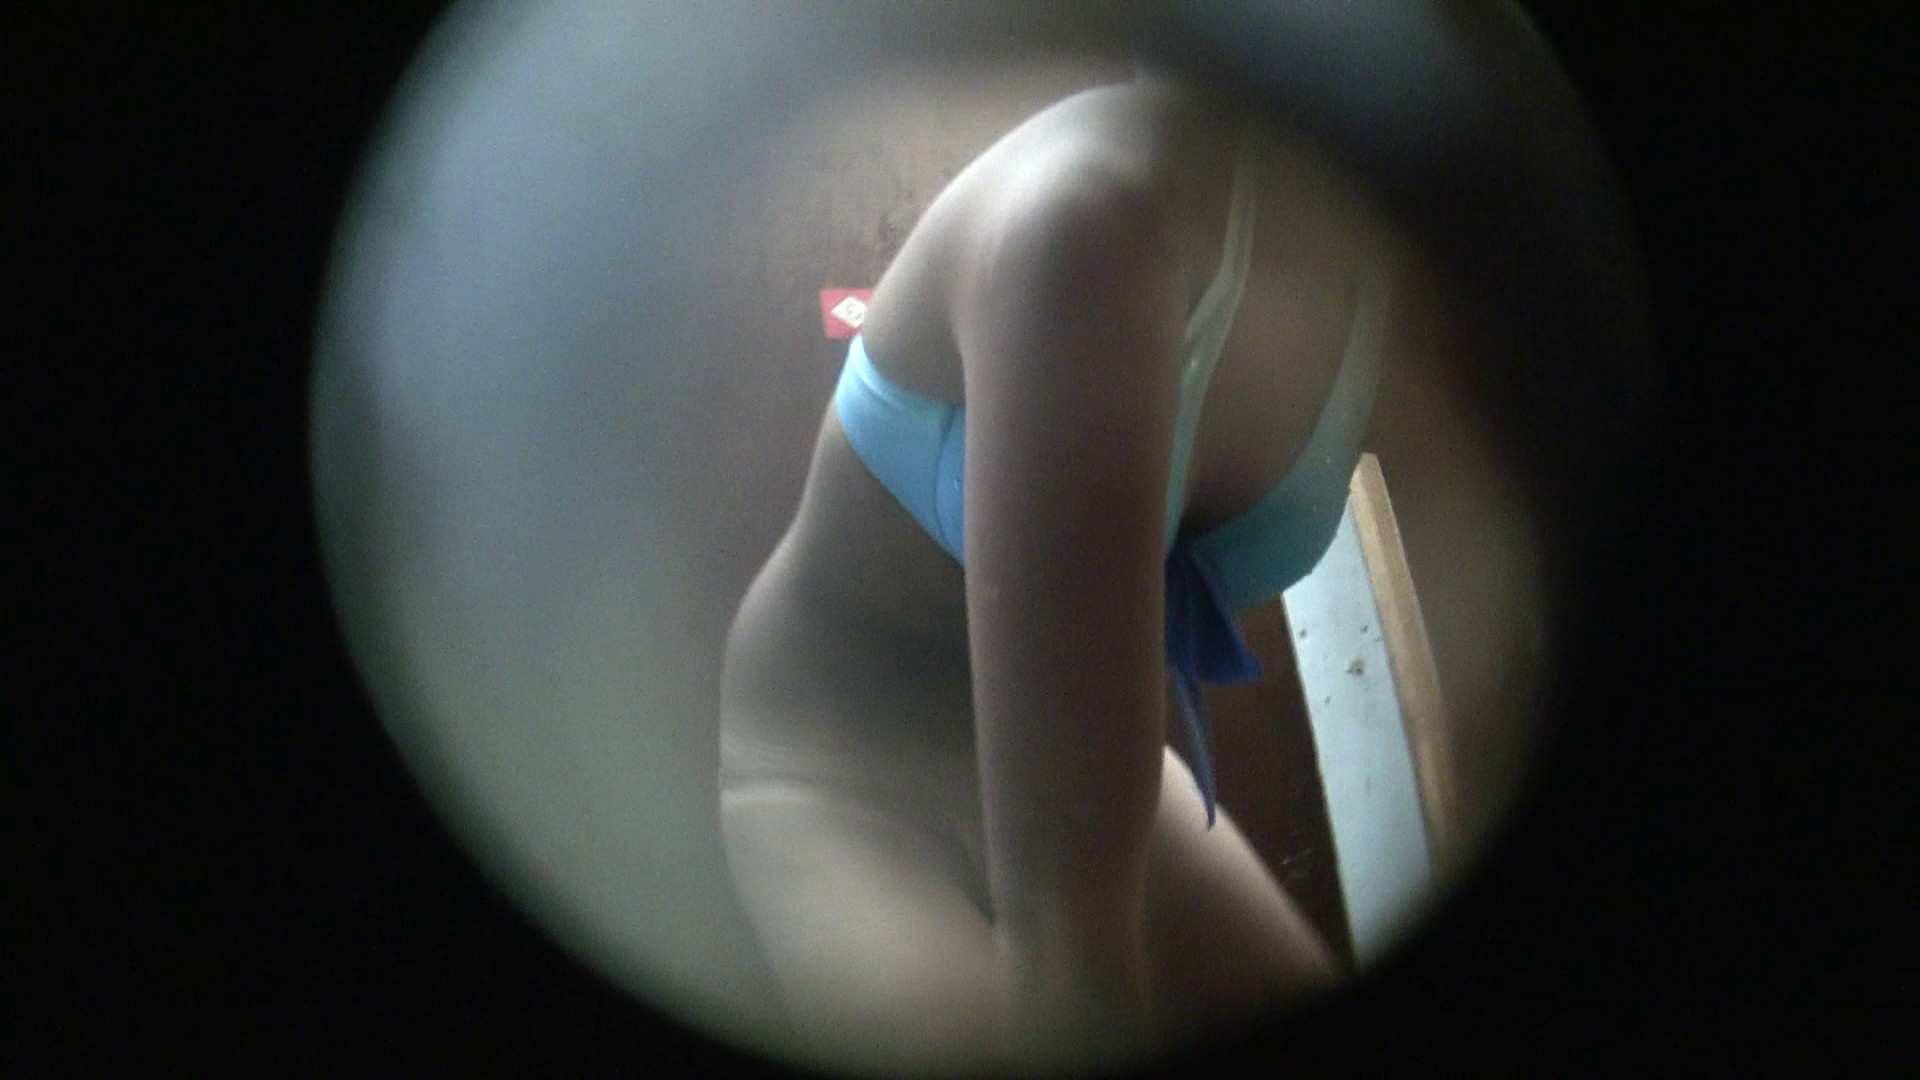 NO.02 見事に日焼けした年齢不詳のお女市さん シャワー室 盗み撮りSEX無修正画像 73pic 19